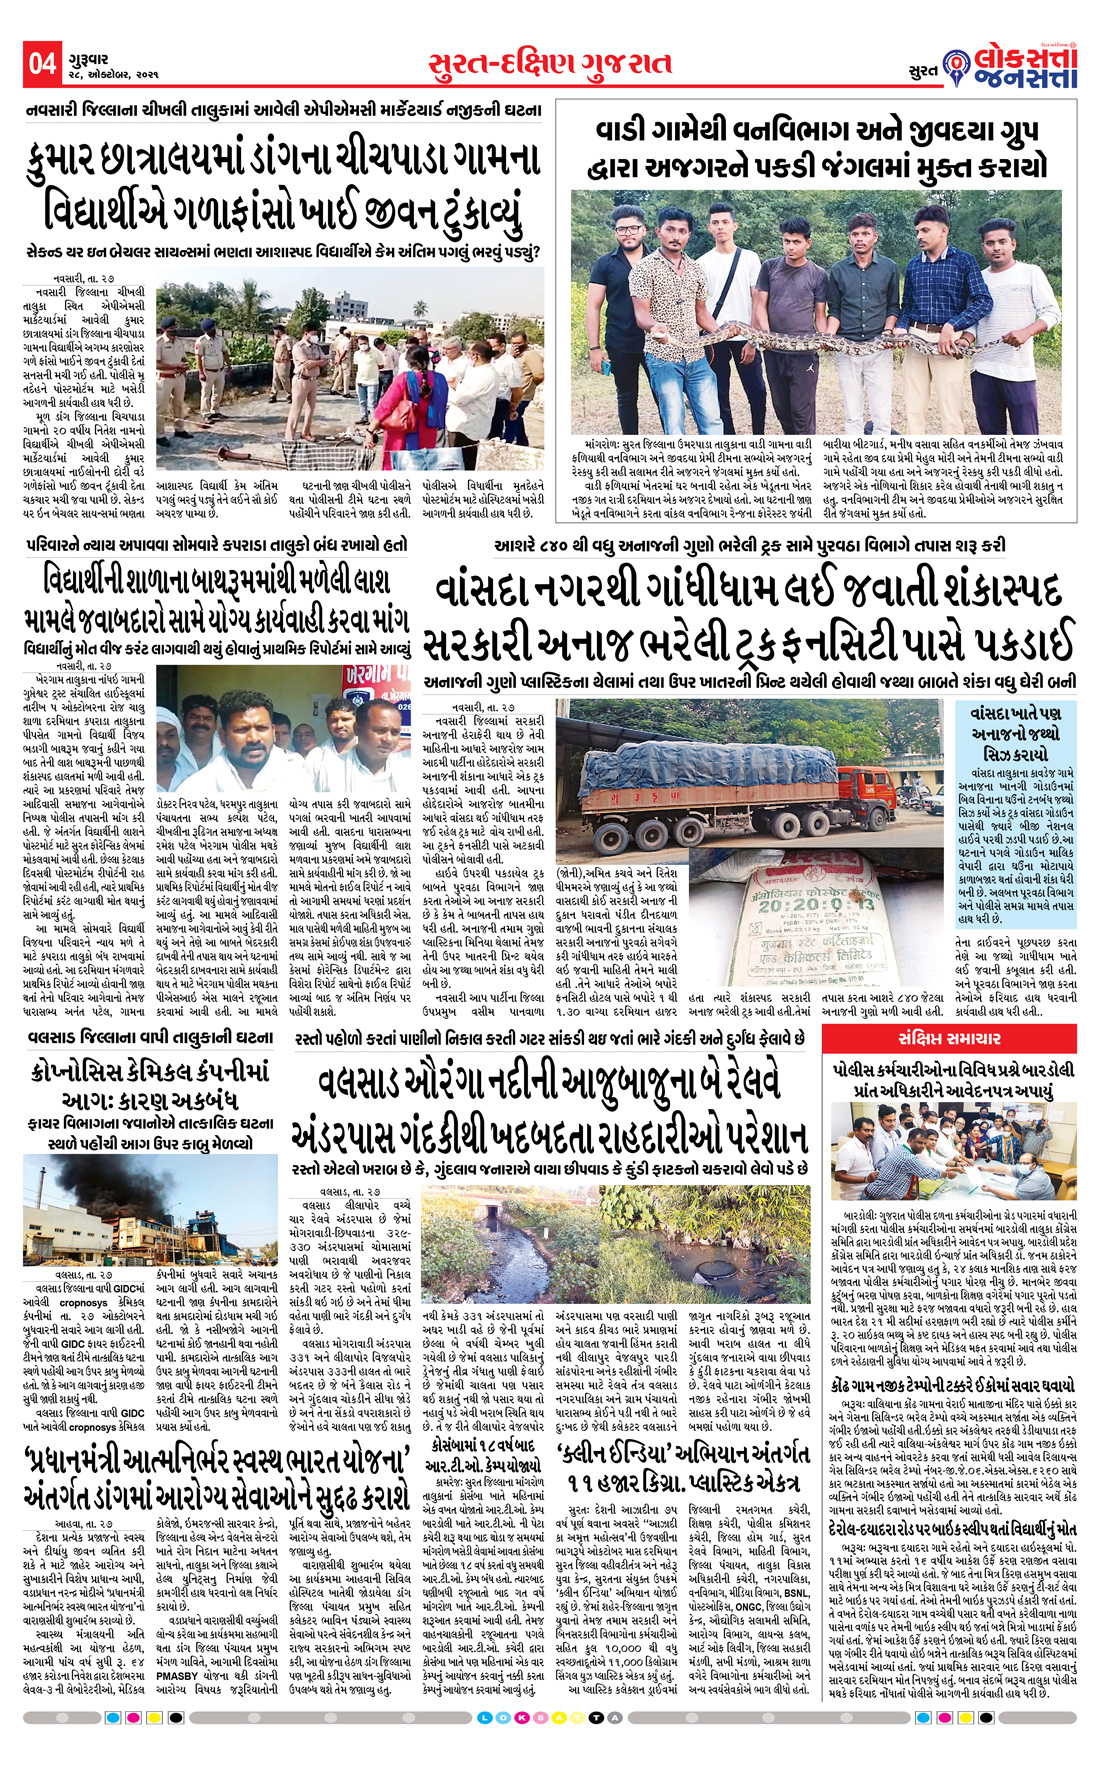 Loksatta Jansatta News Papaer E-paper dated 2021-10-28   Page 4